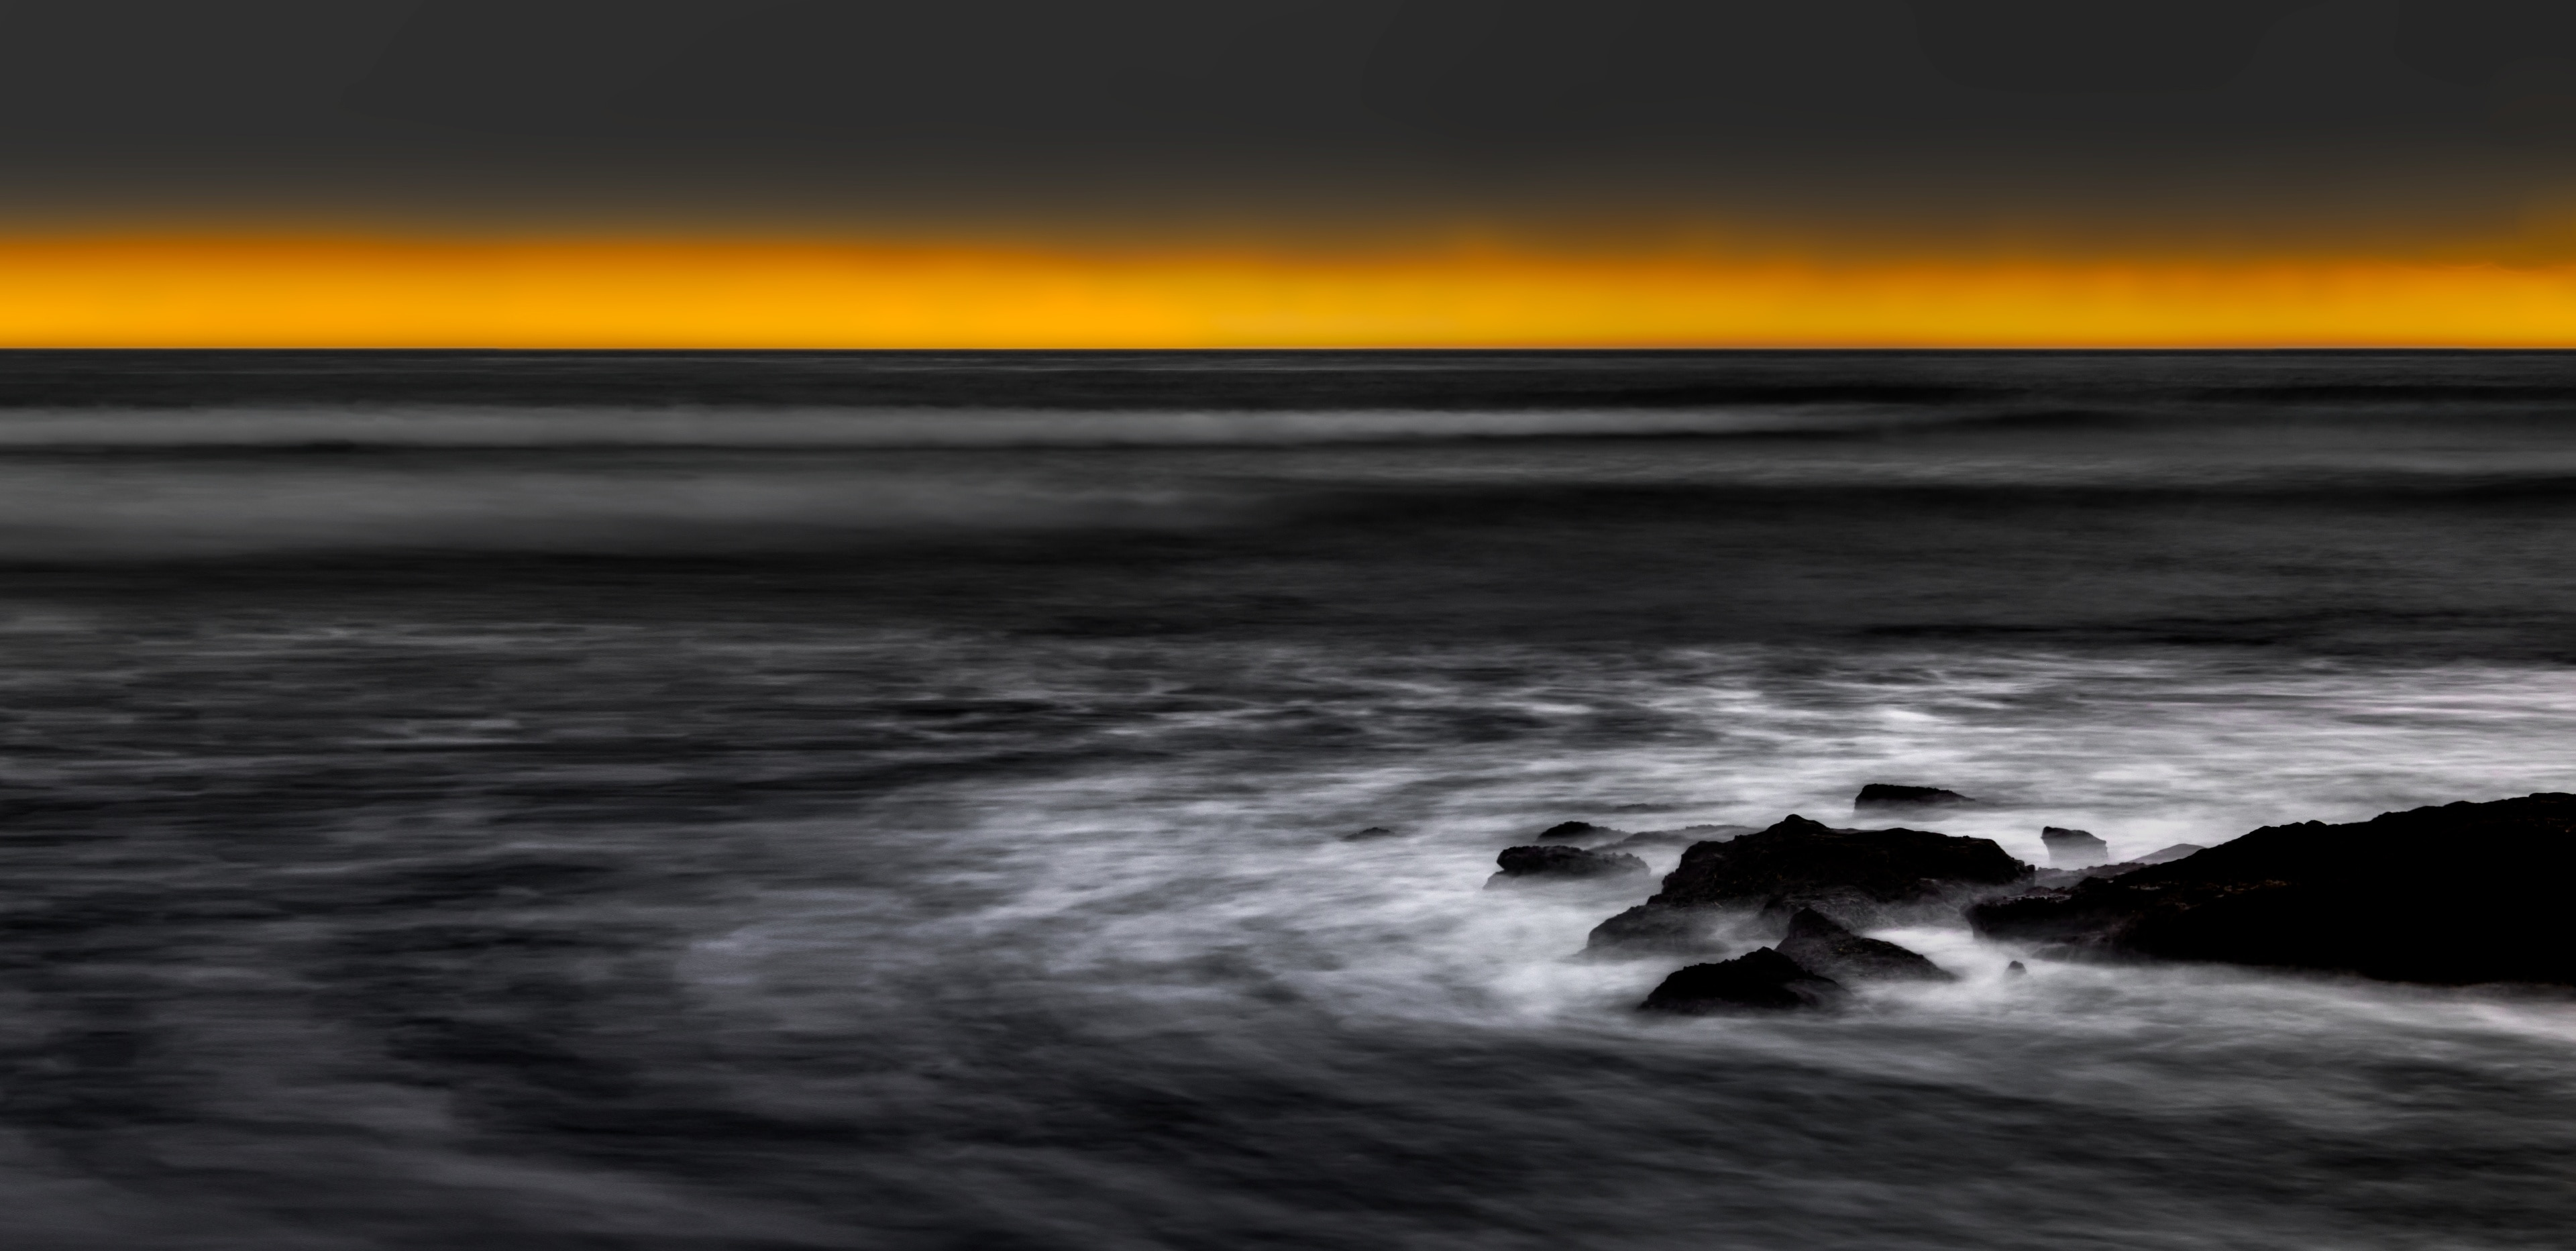 Sunset Cliffs, San Diego, San Diego County, California, United States of America